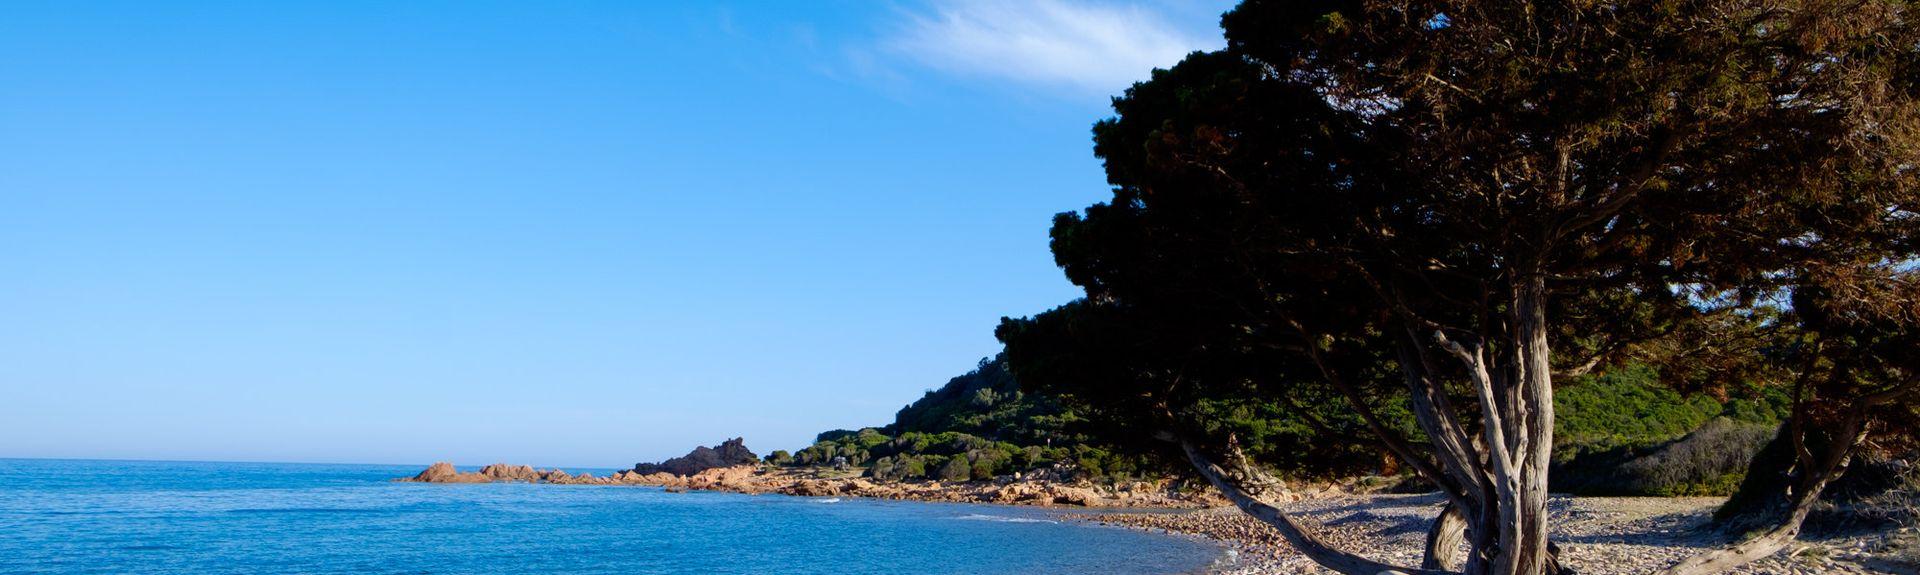 Esterzili, Sardinien, Italien